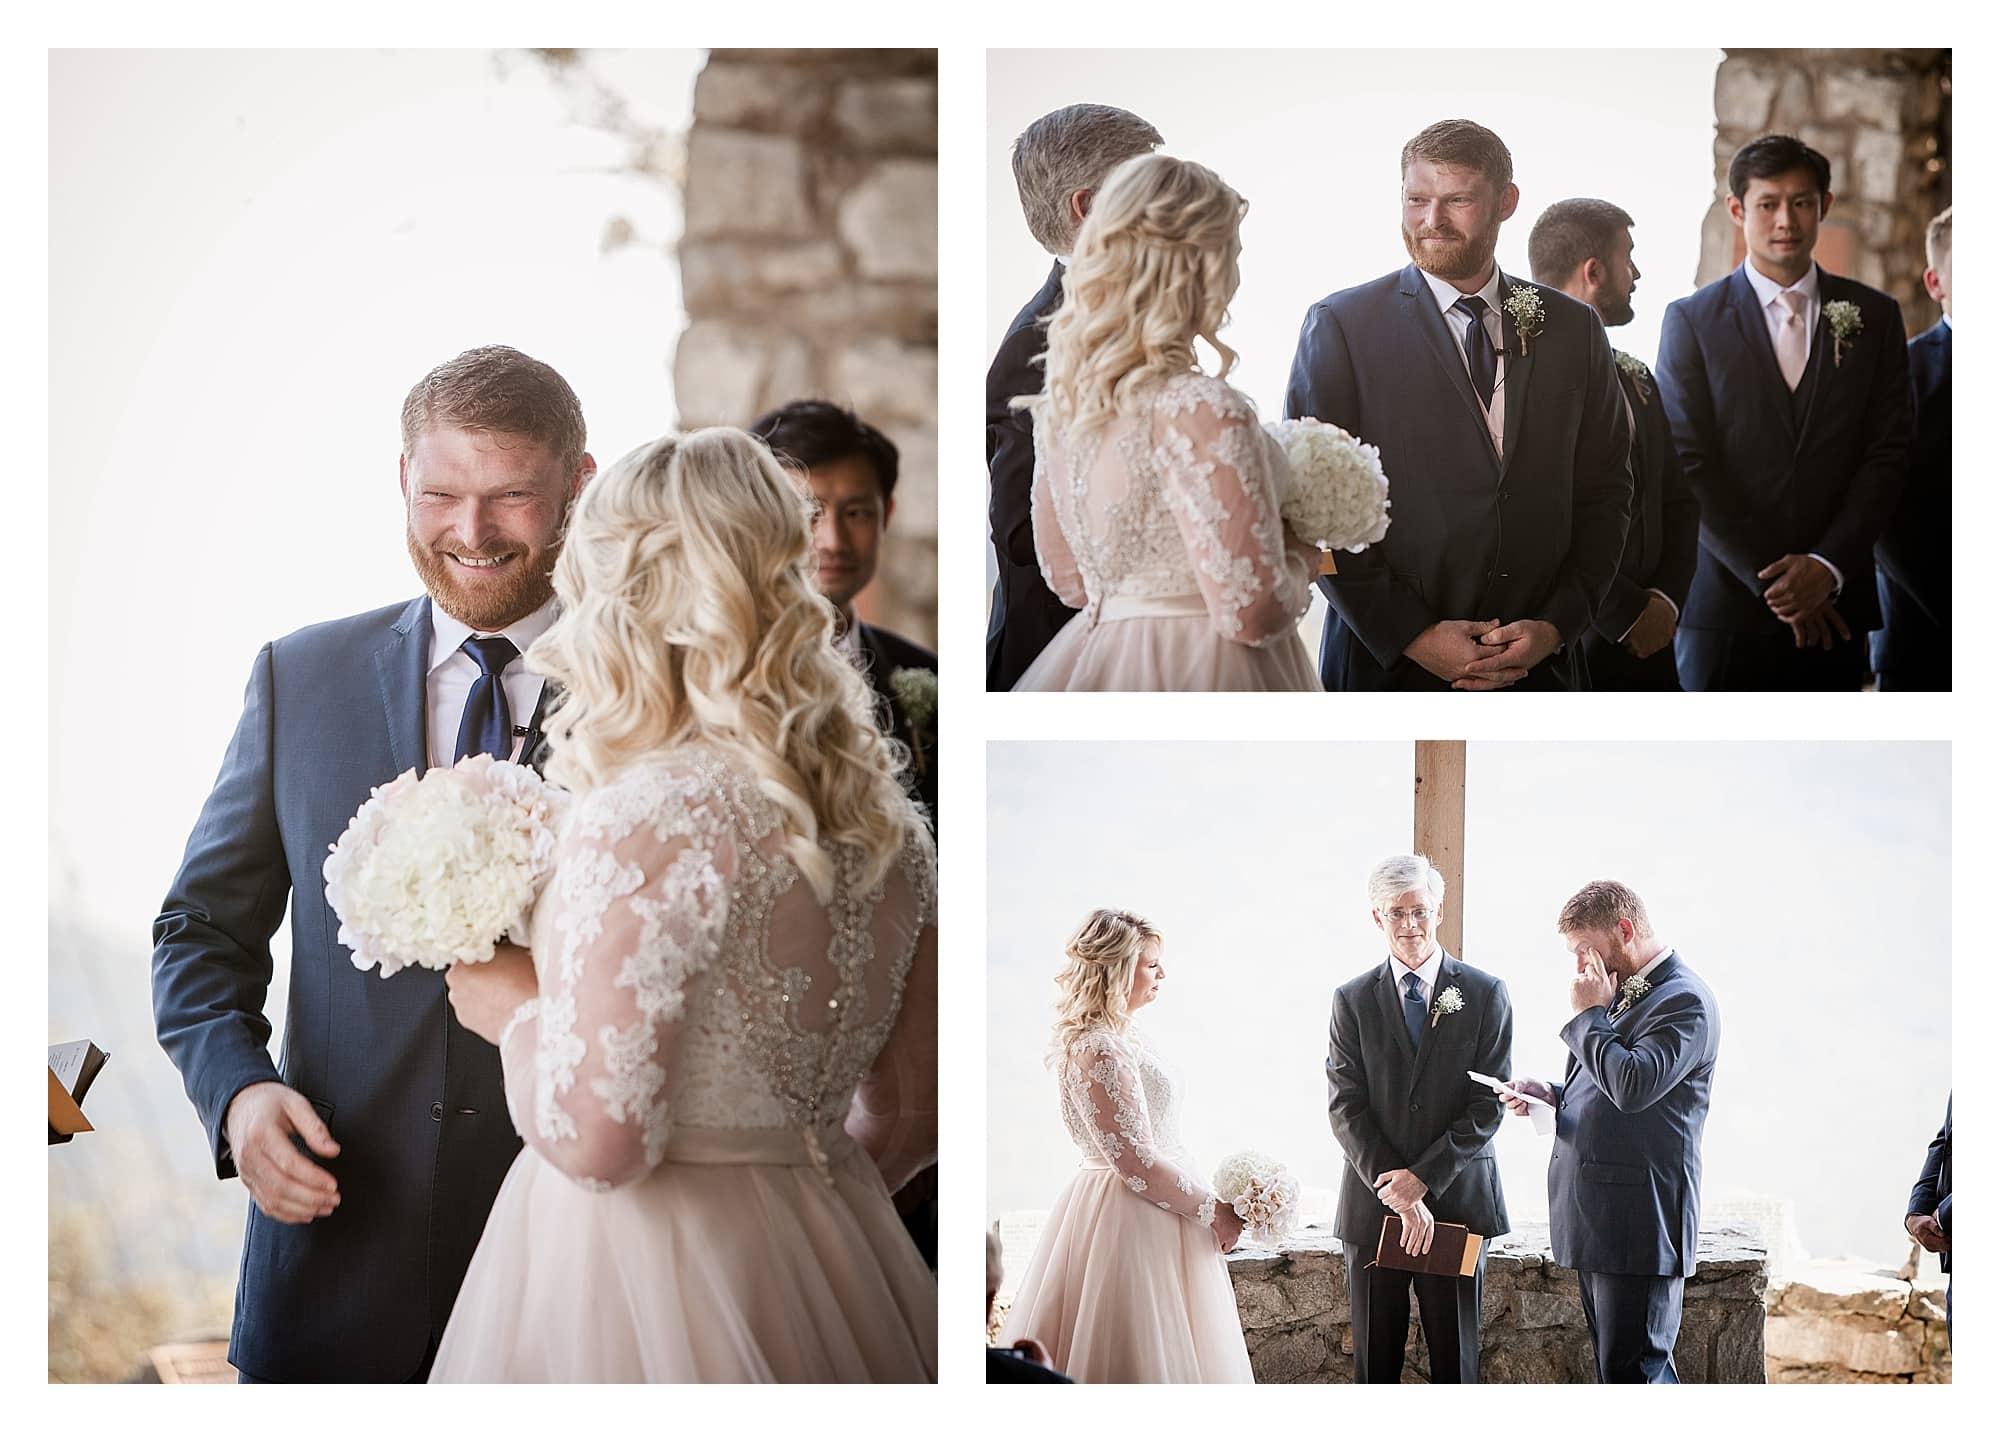 Kathy-Beaver-Wedding-Photography